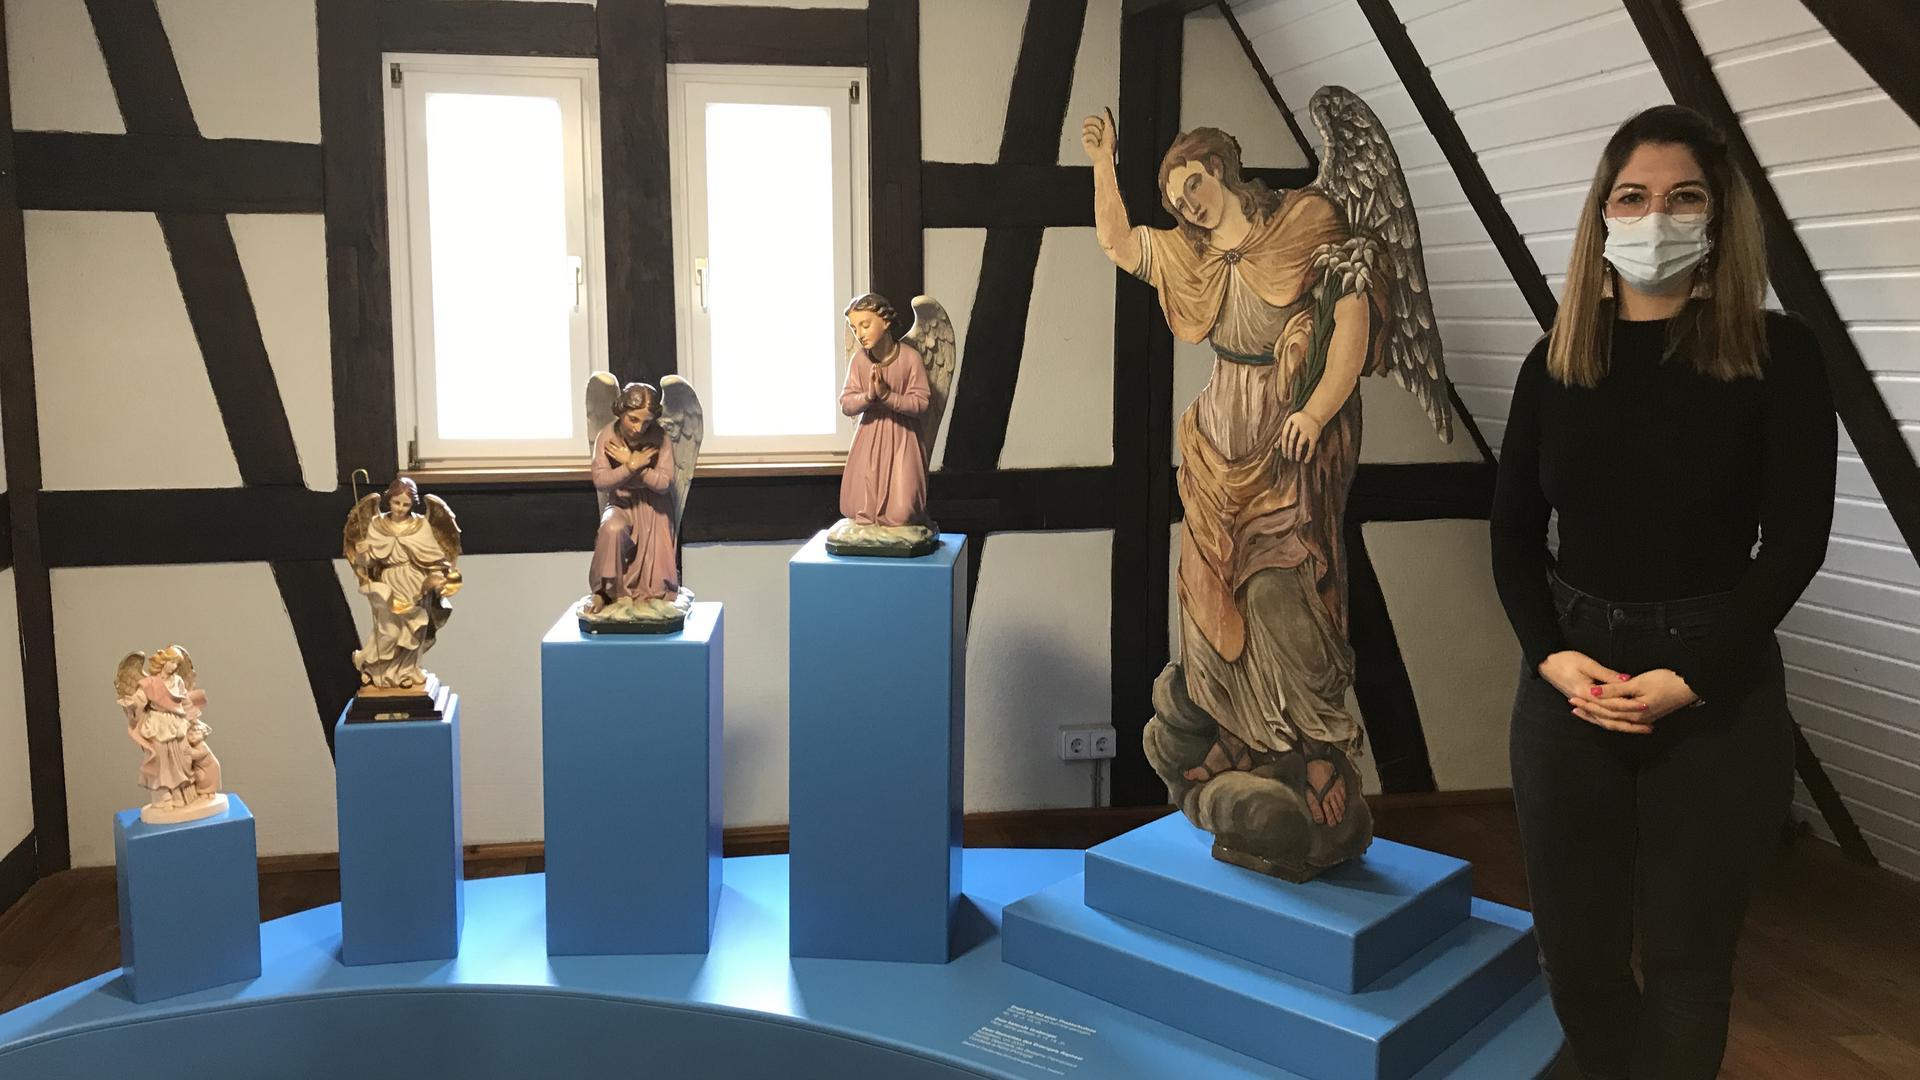 Linda Obhof steht im Schutzengelmuseum neben Engelsfiguren